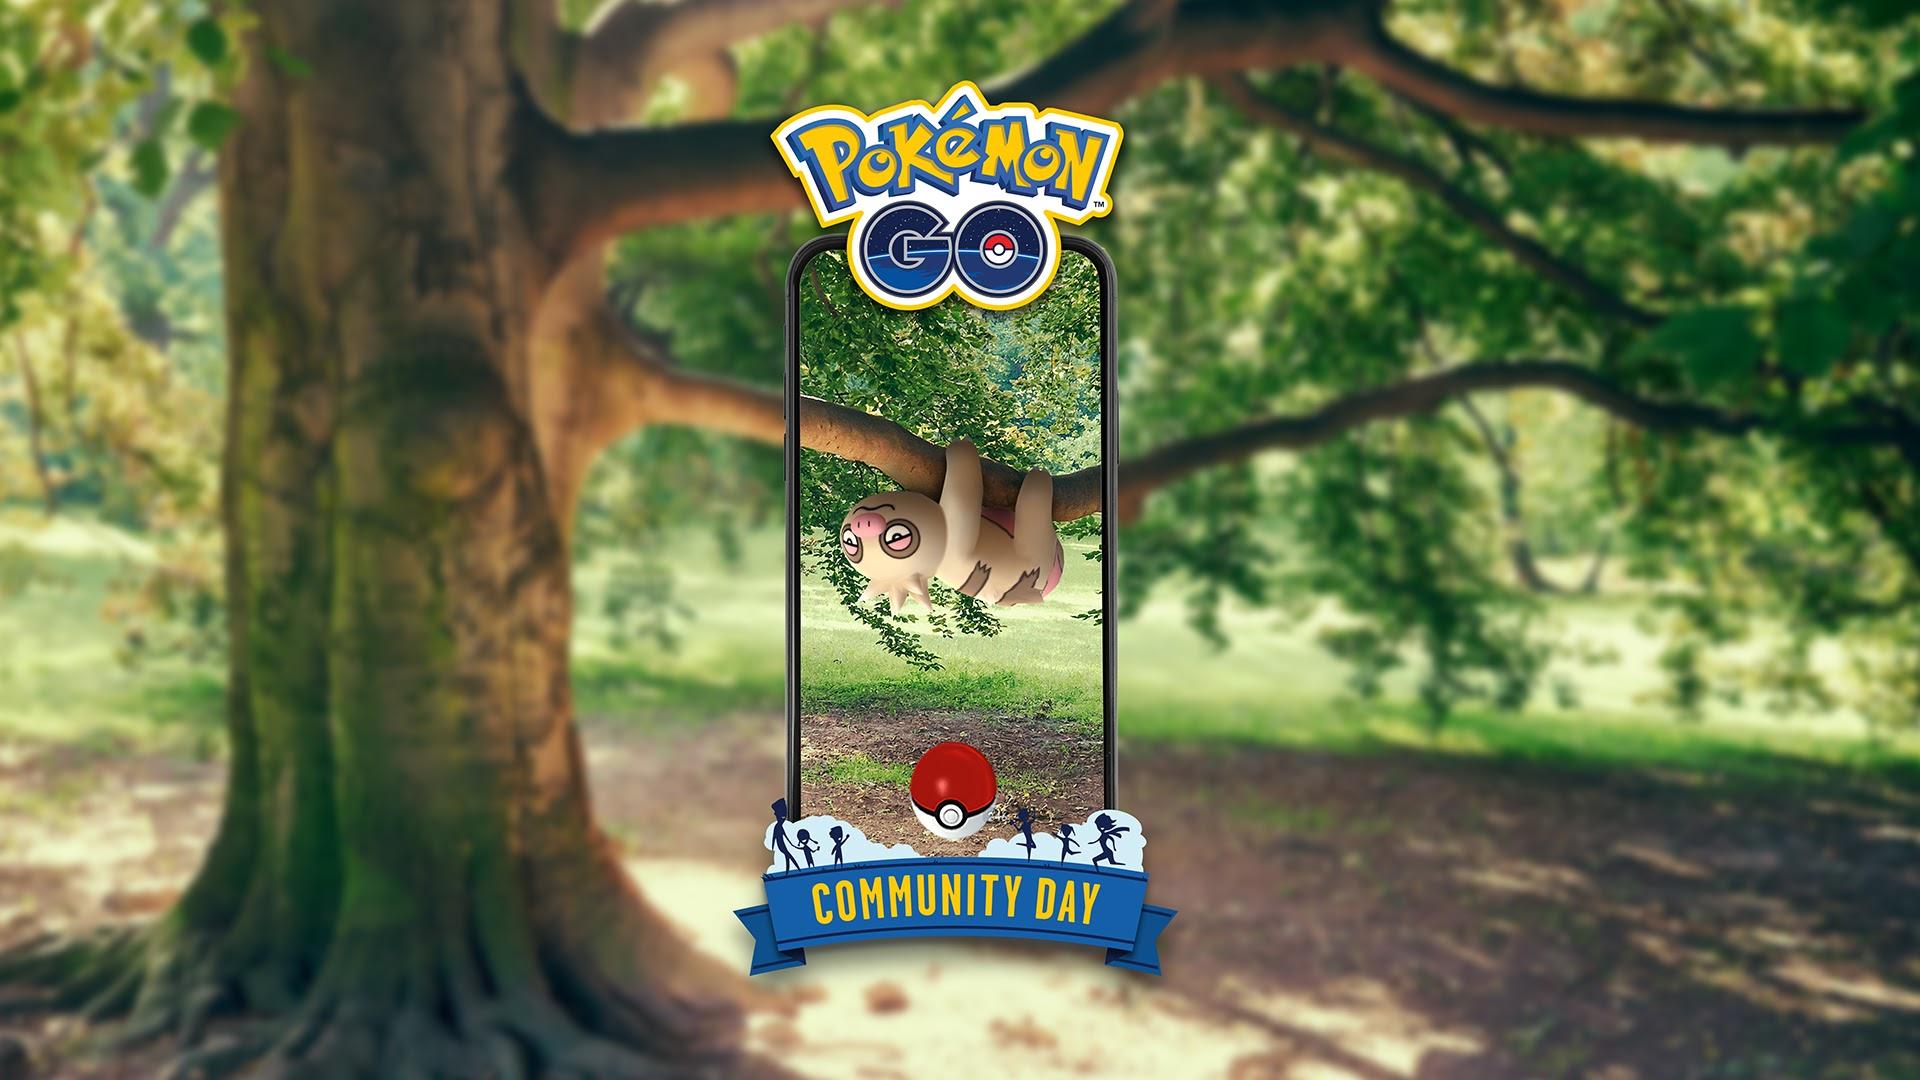 Pokémon Go June Community Day will feature Slakoth